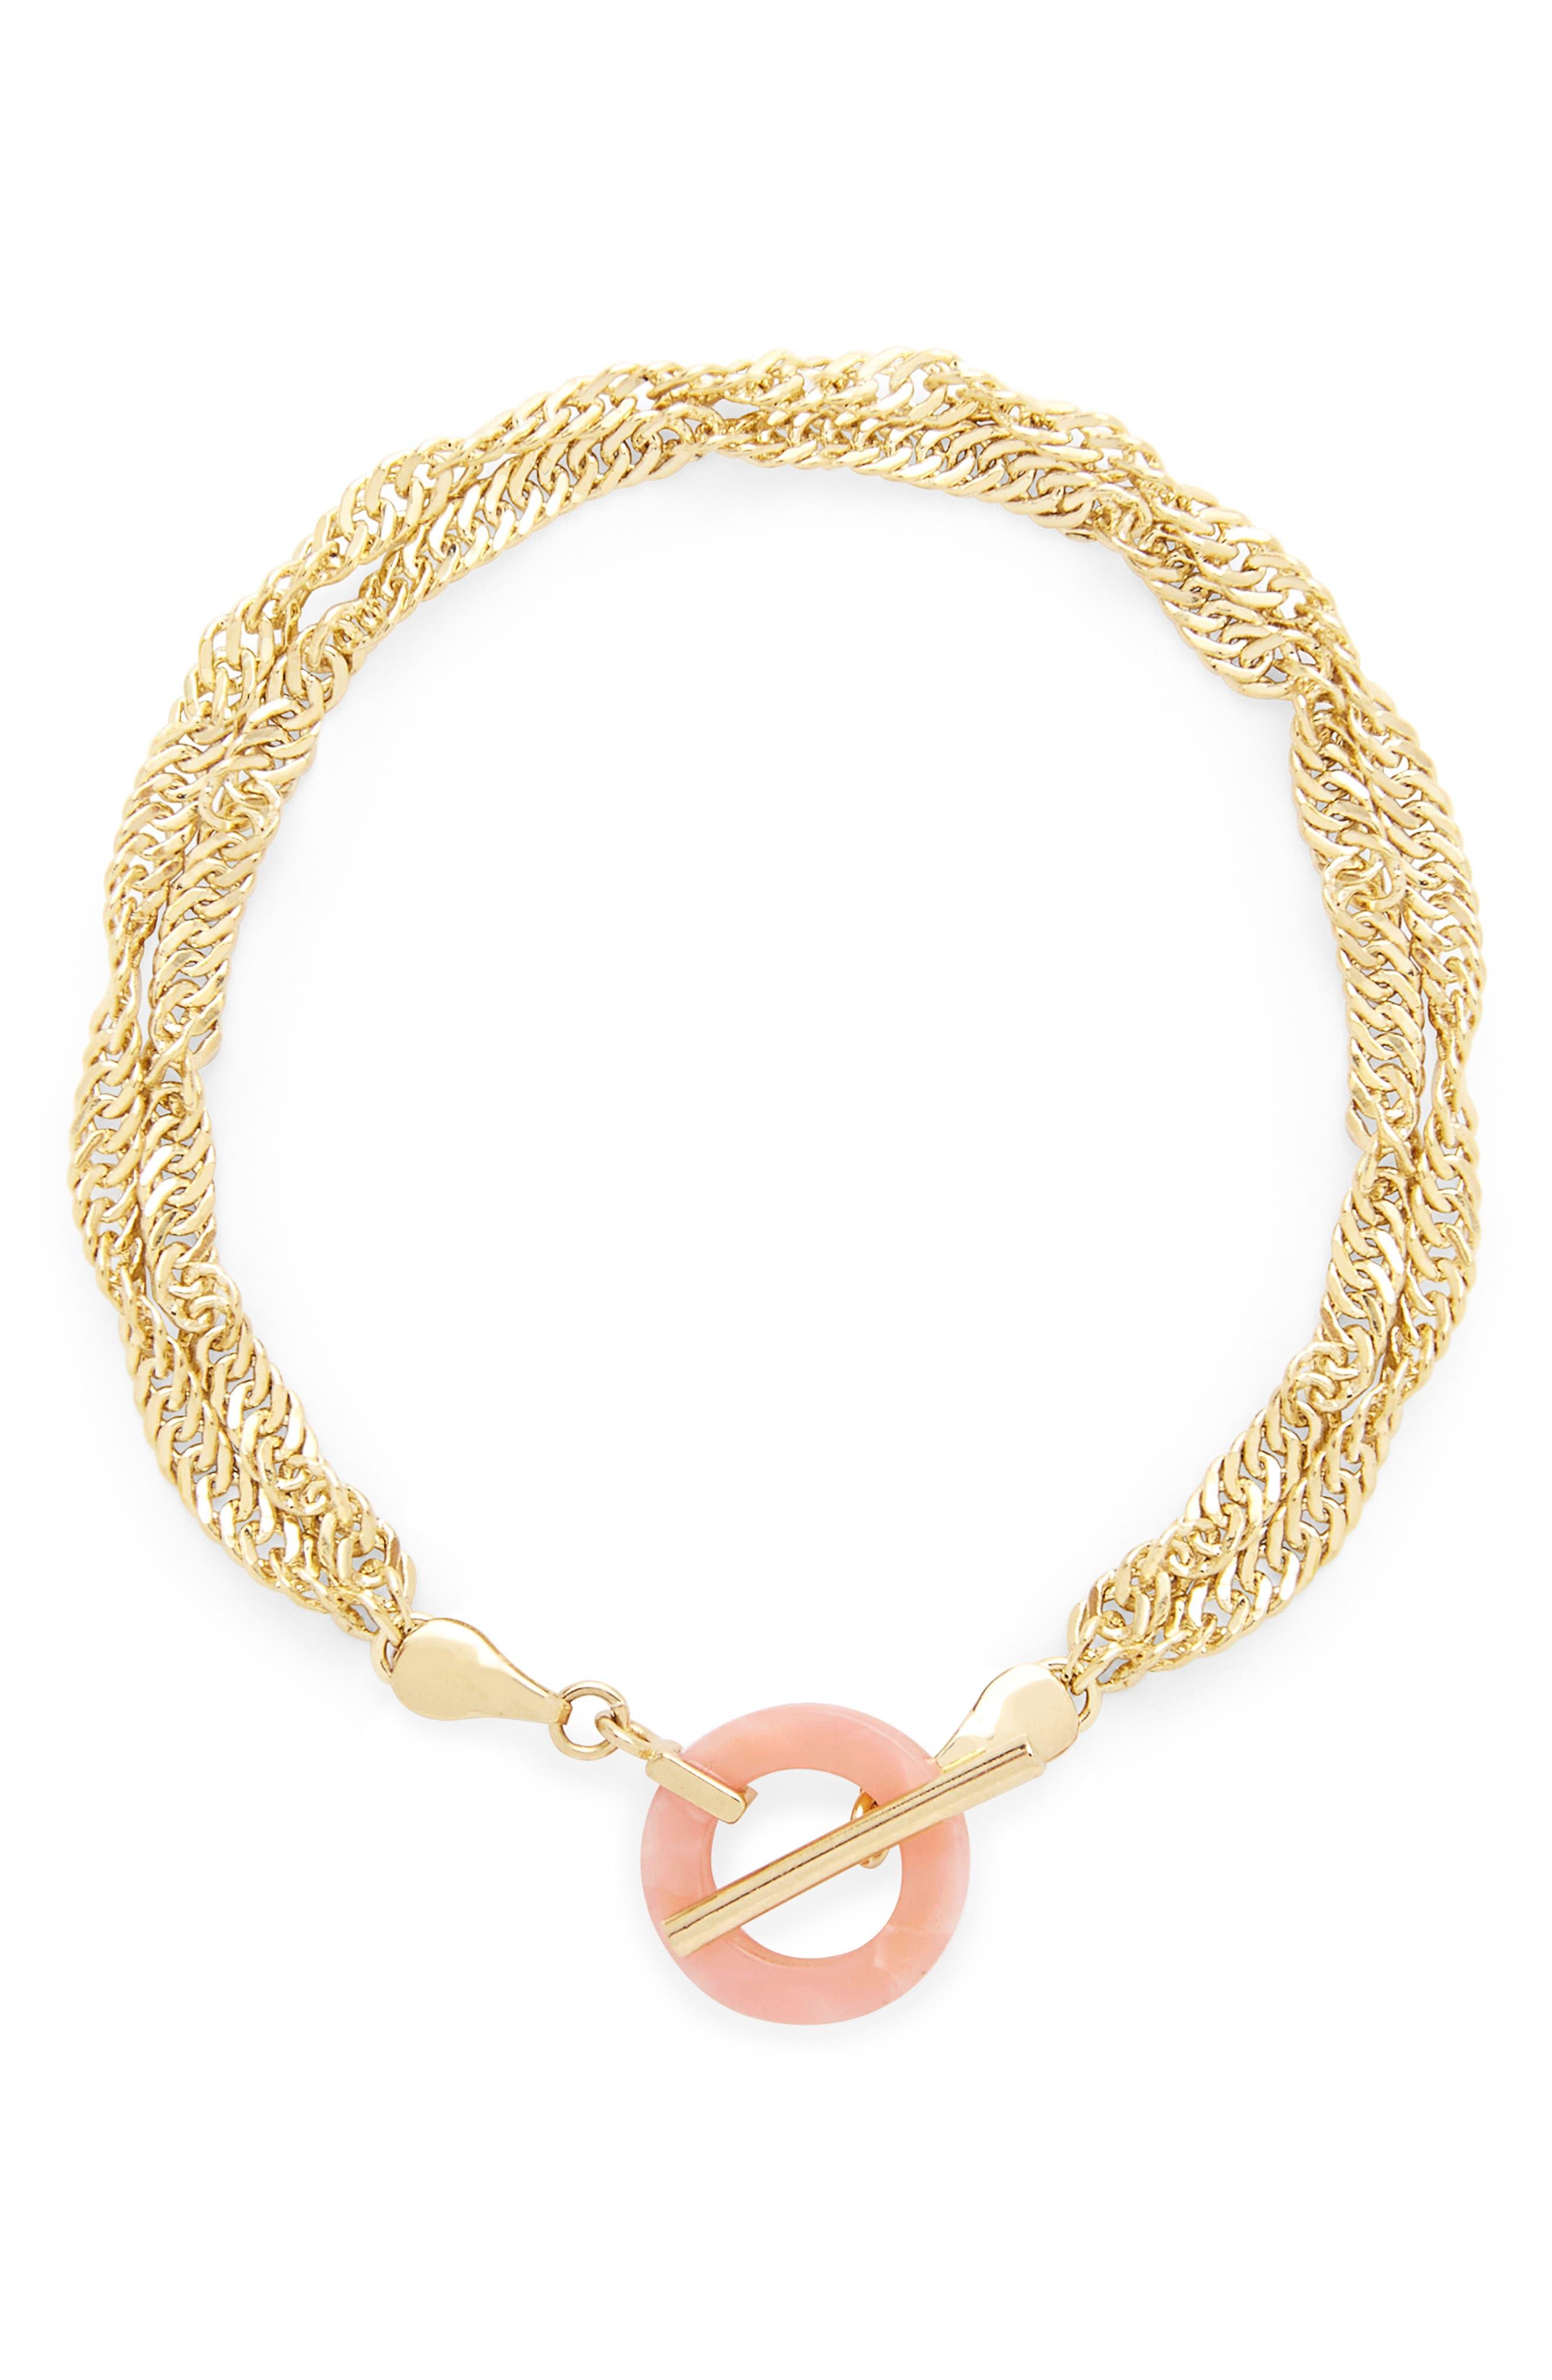 Maggie Toggle Bracelet